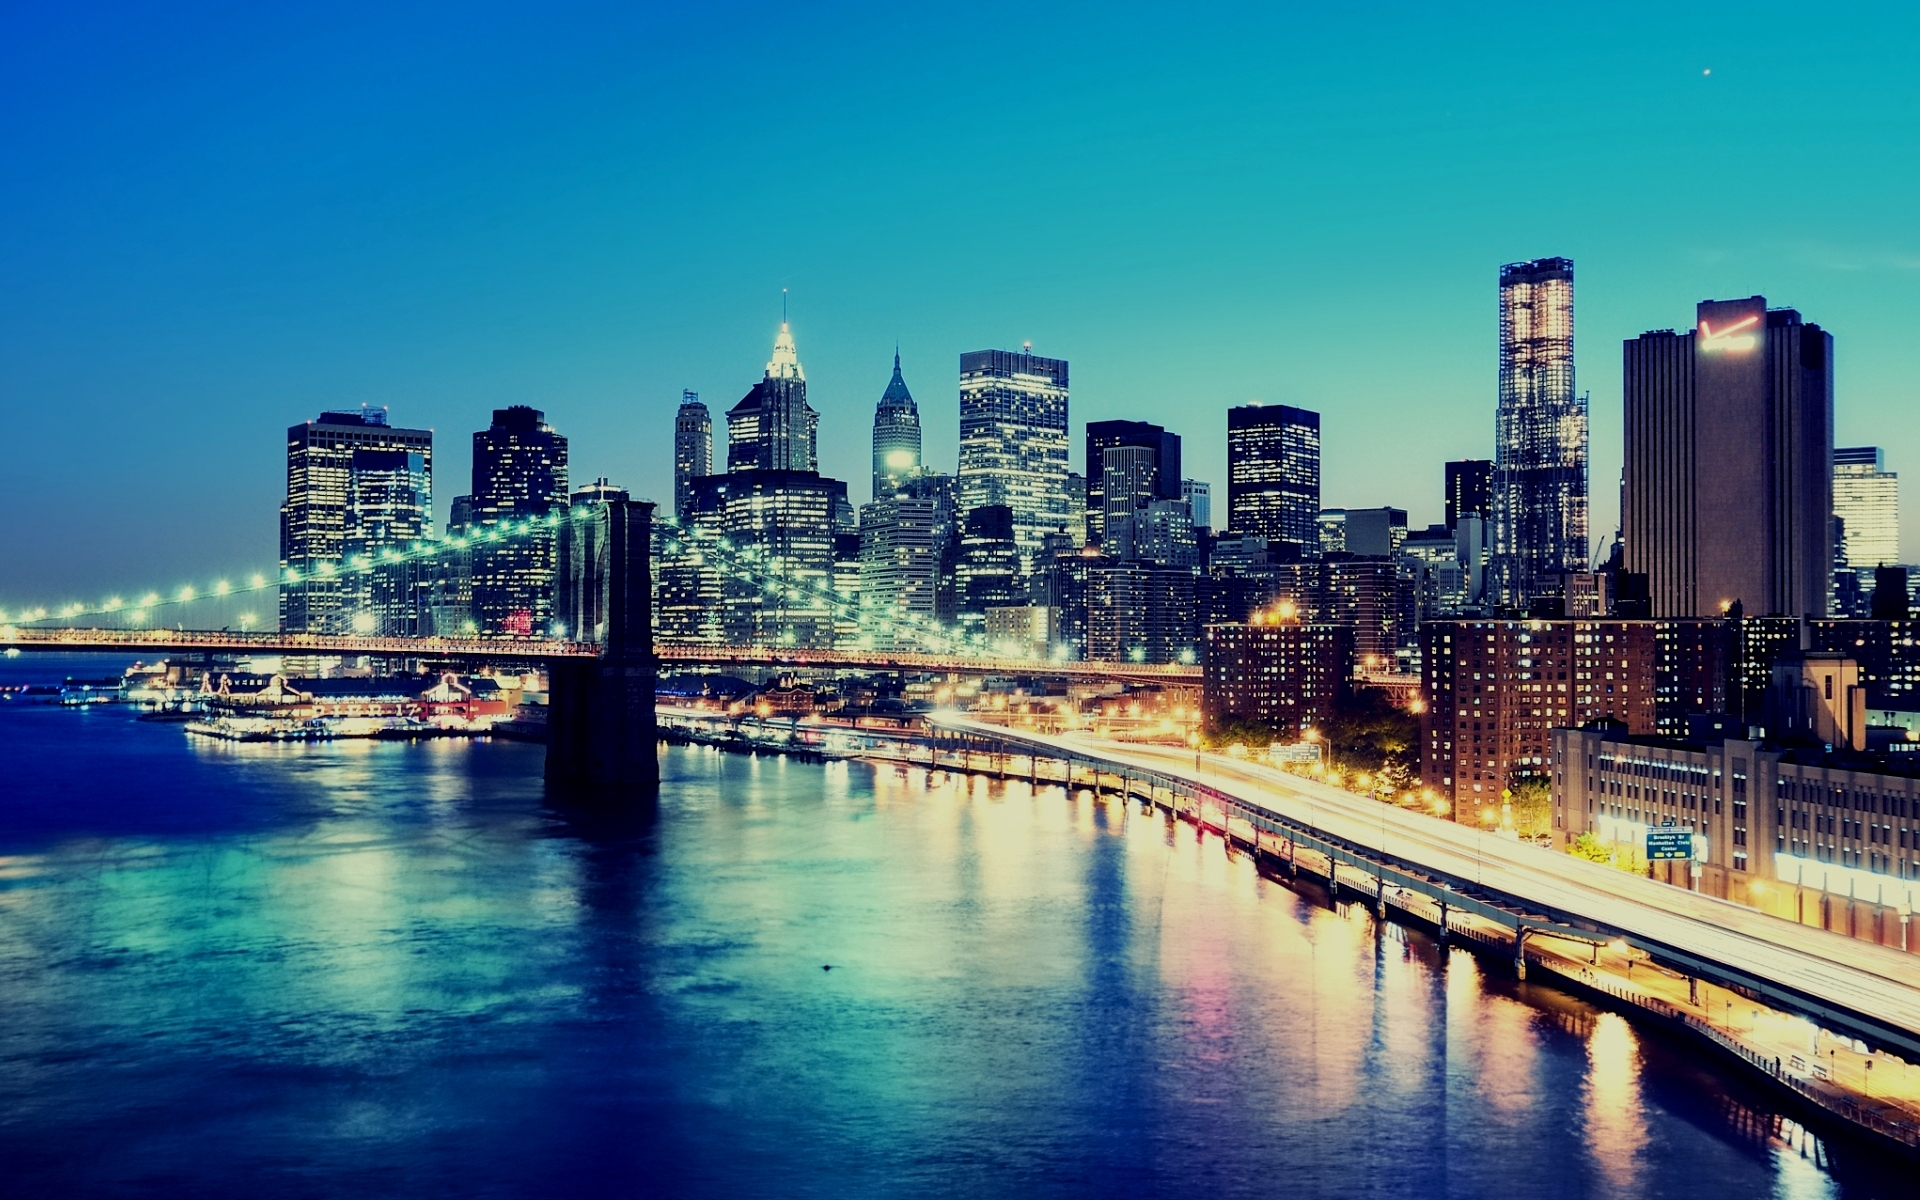 Night, city lights, buildings, skyscrapers, new york city, ny, lower manhattan